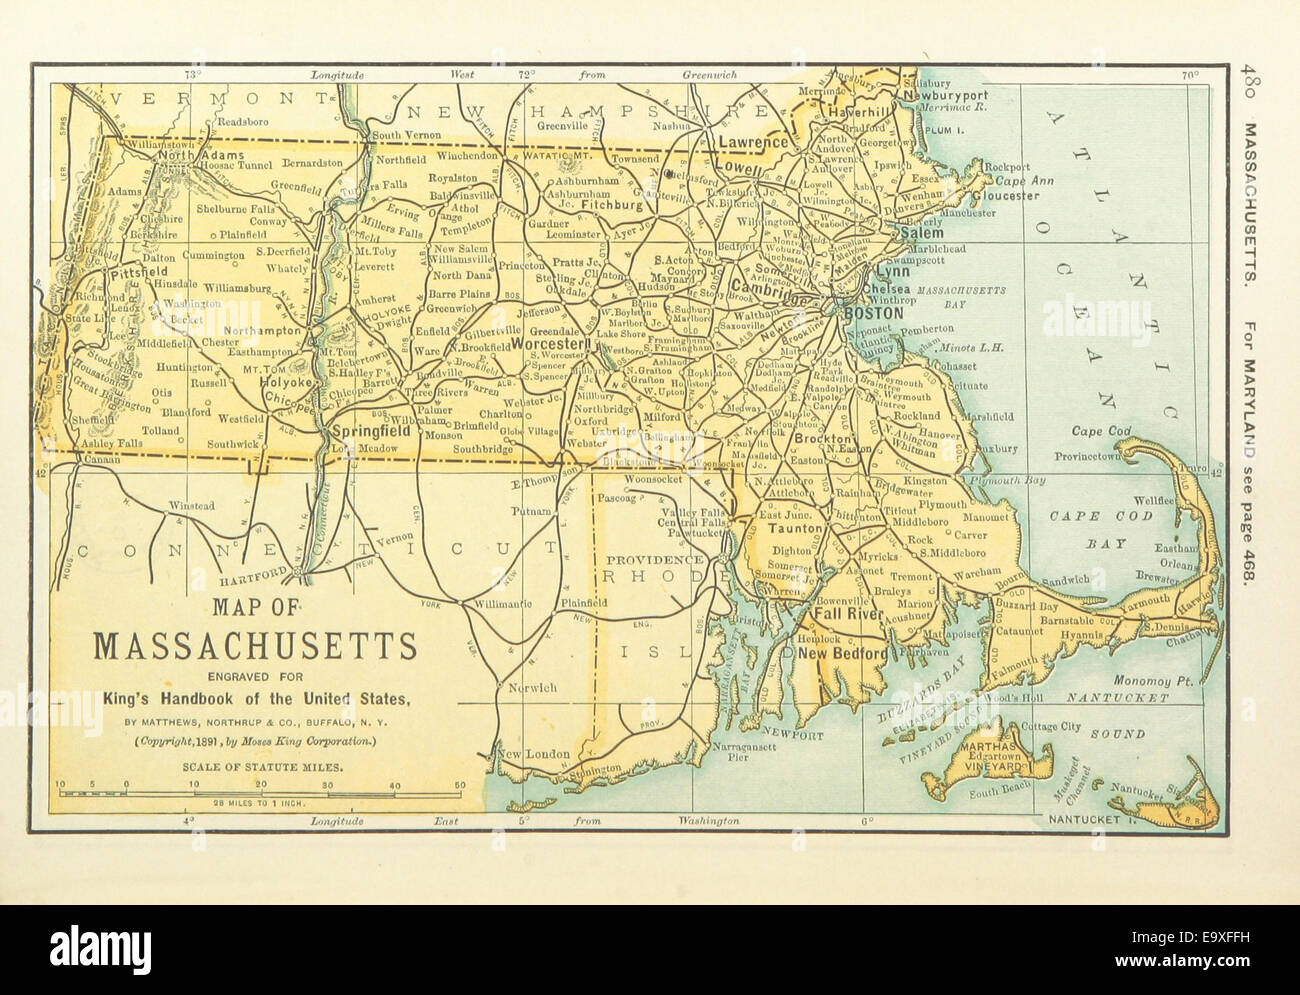 Us Maps1891 P482 Map Of Massachusetts Stock Photo 74956325 Alamy - Massachusetts-on-the-us-map